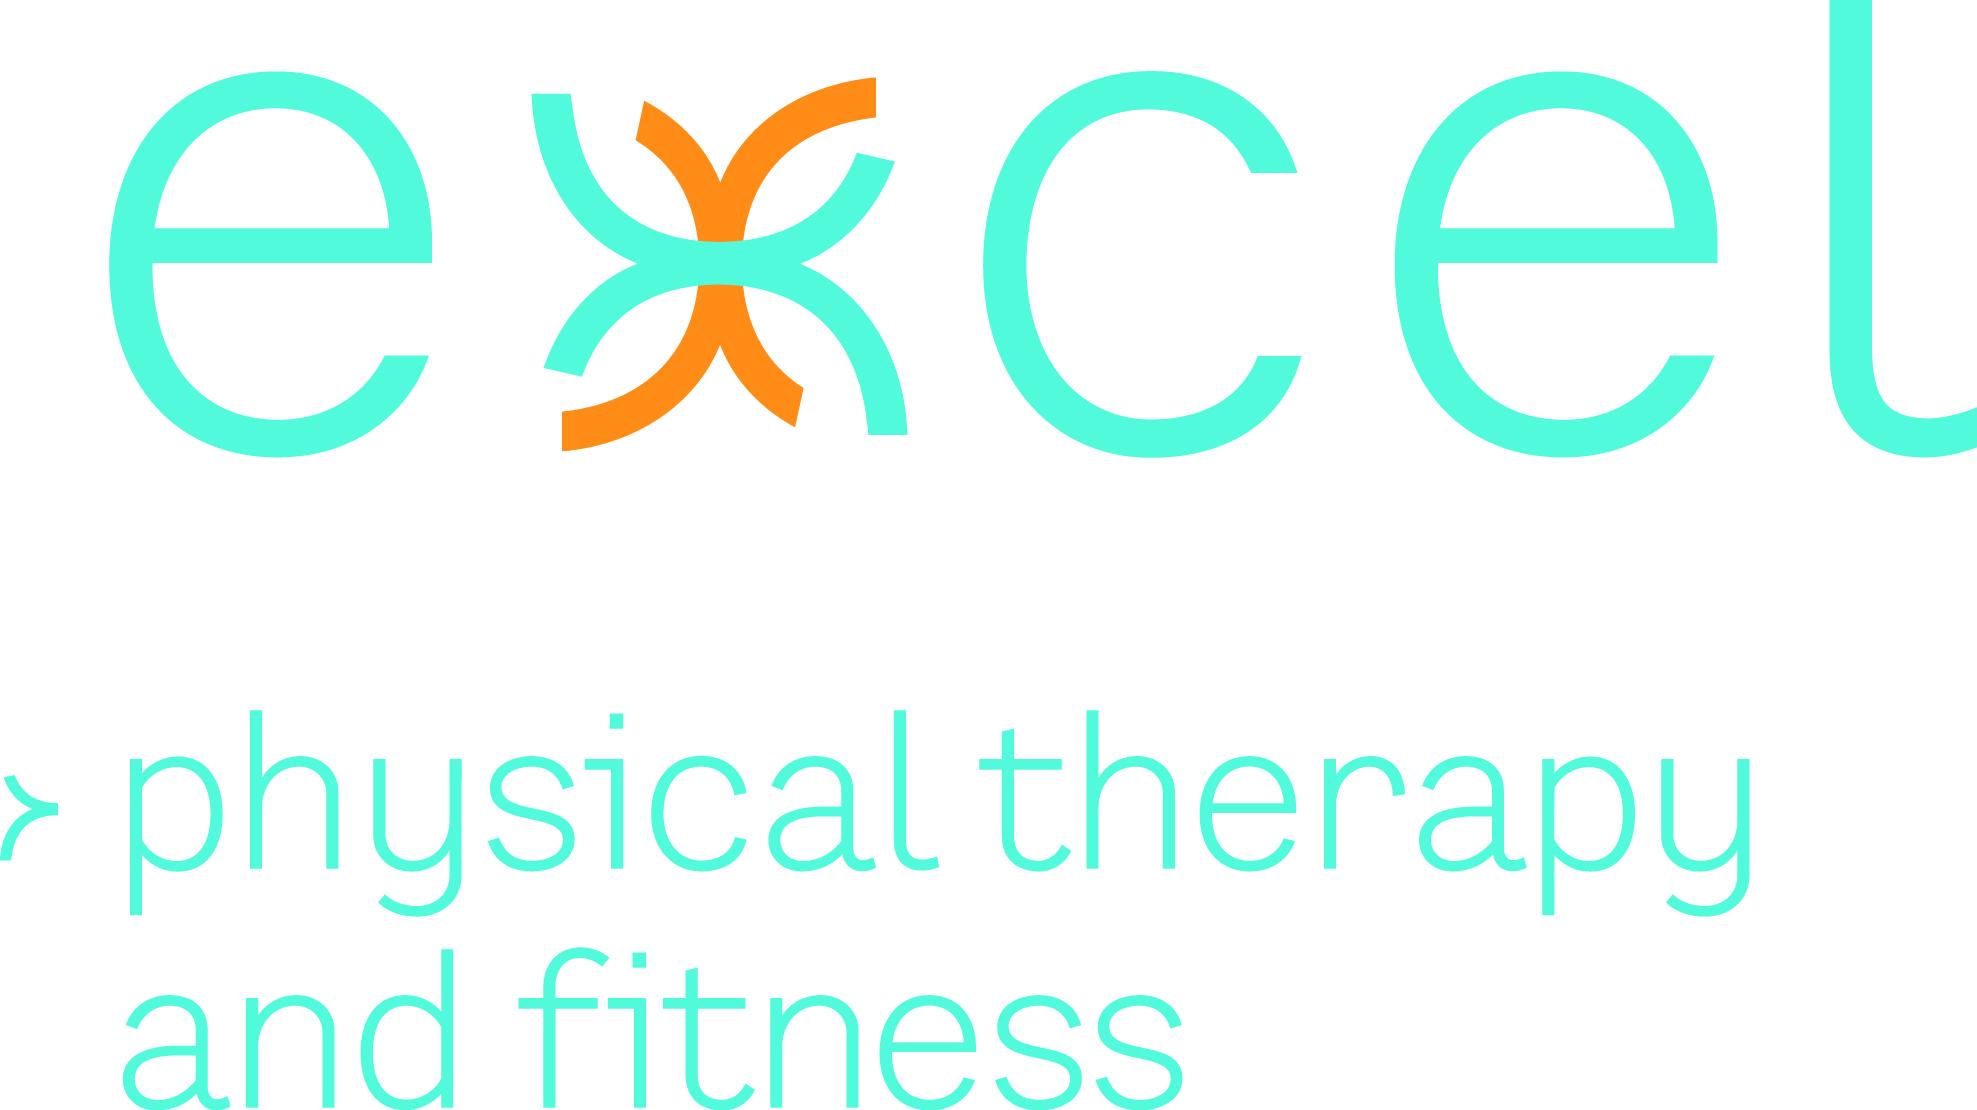 Excel physical therapy - Excel Physical Therapy And Fitness Logo